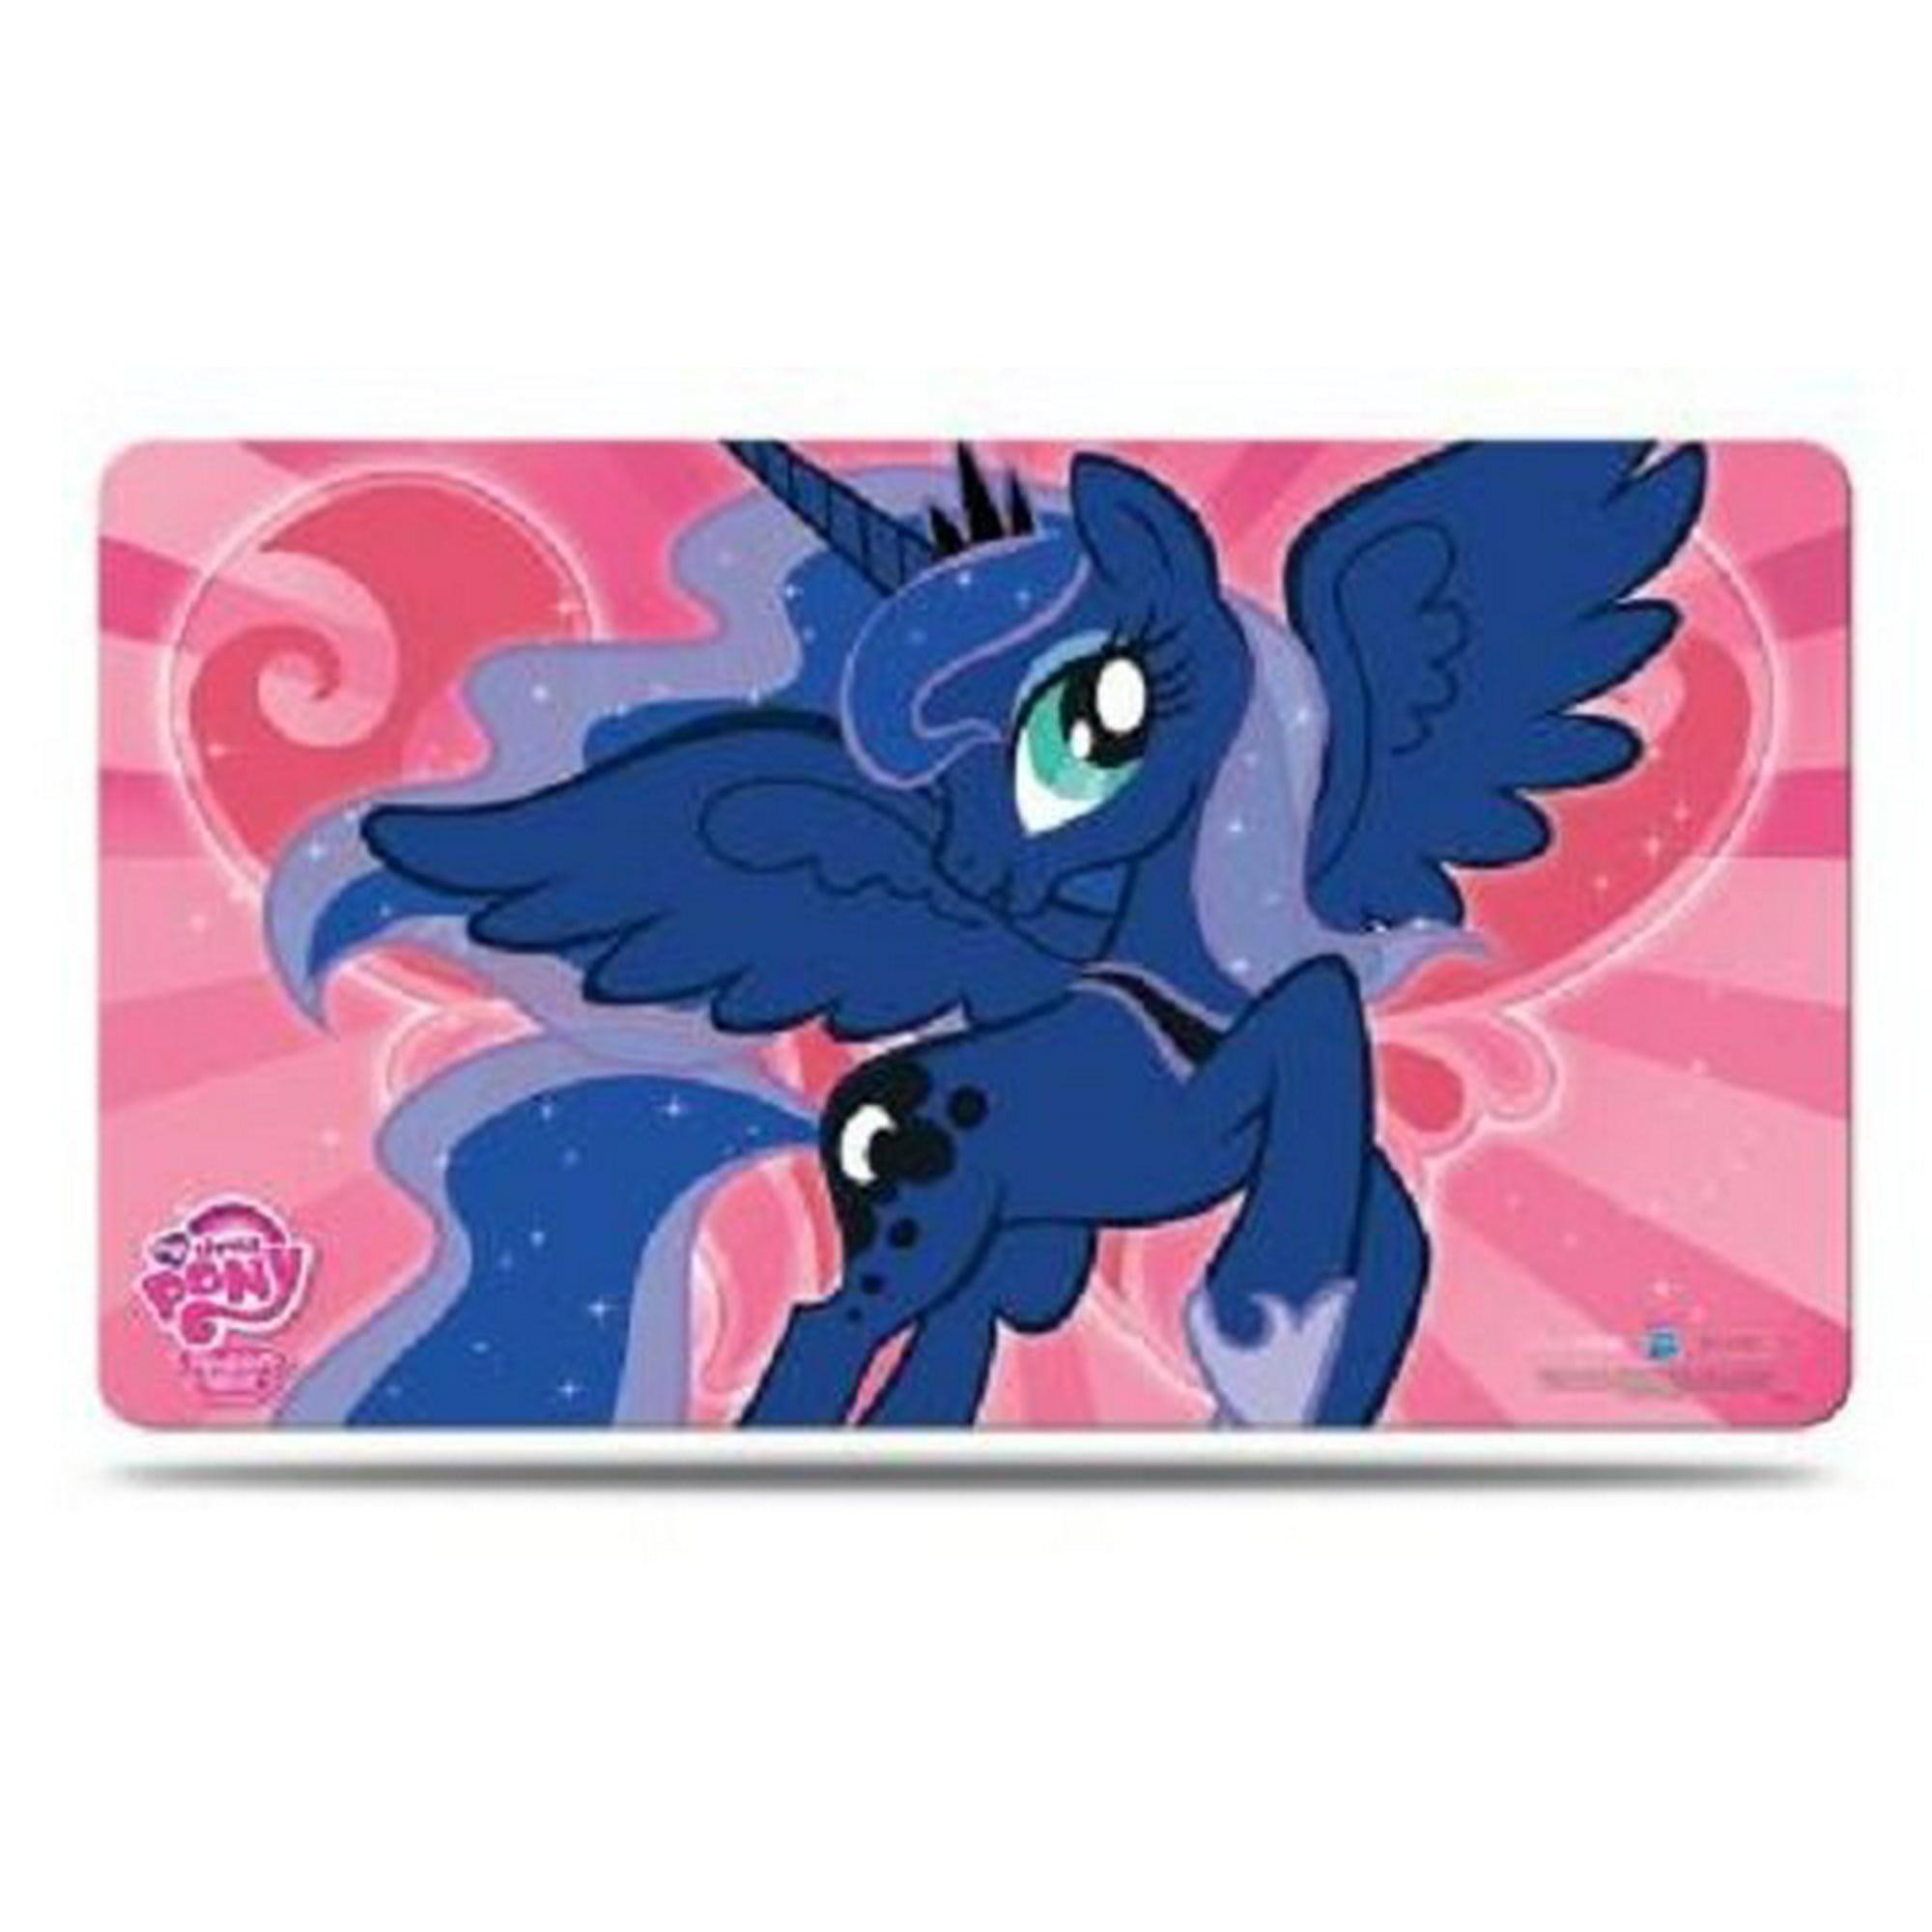 My Little Pony Princess Luna Playmat With Playmat Tube Walmart Canada